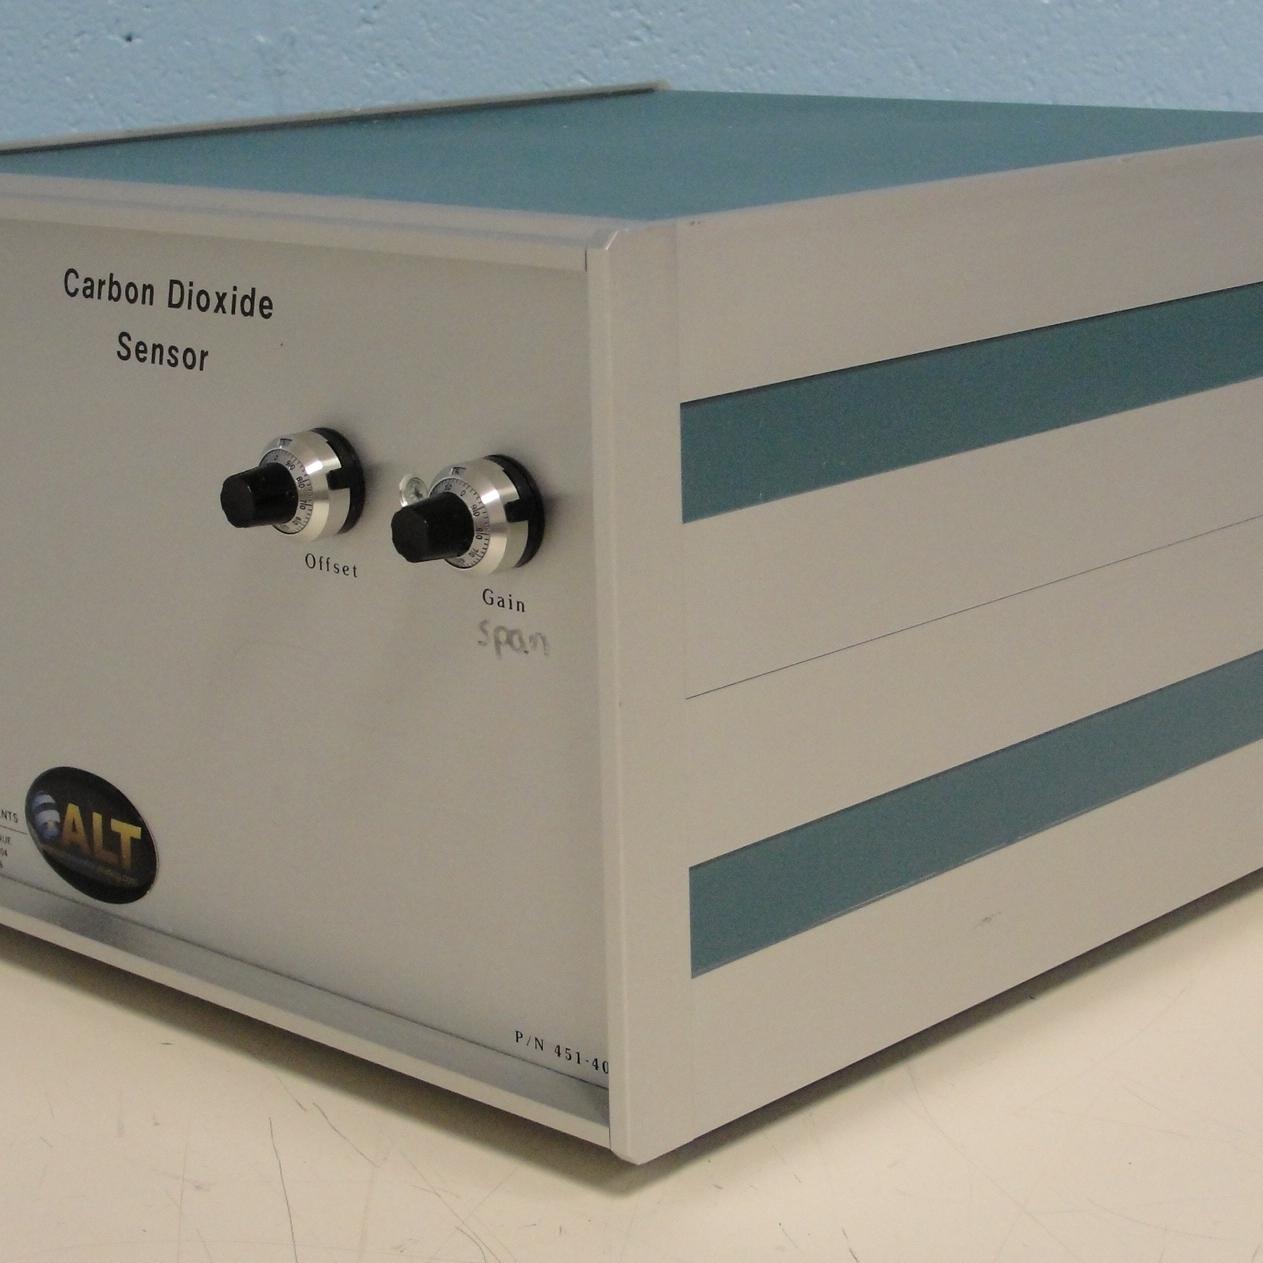 Columbus Instruments Carbon Dioxide Sensor Model CO2 Sensor Image